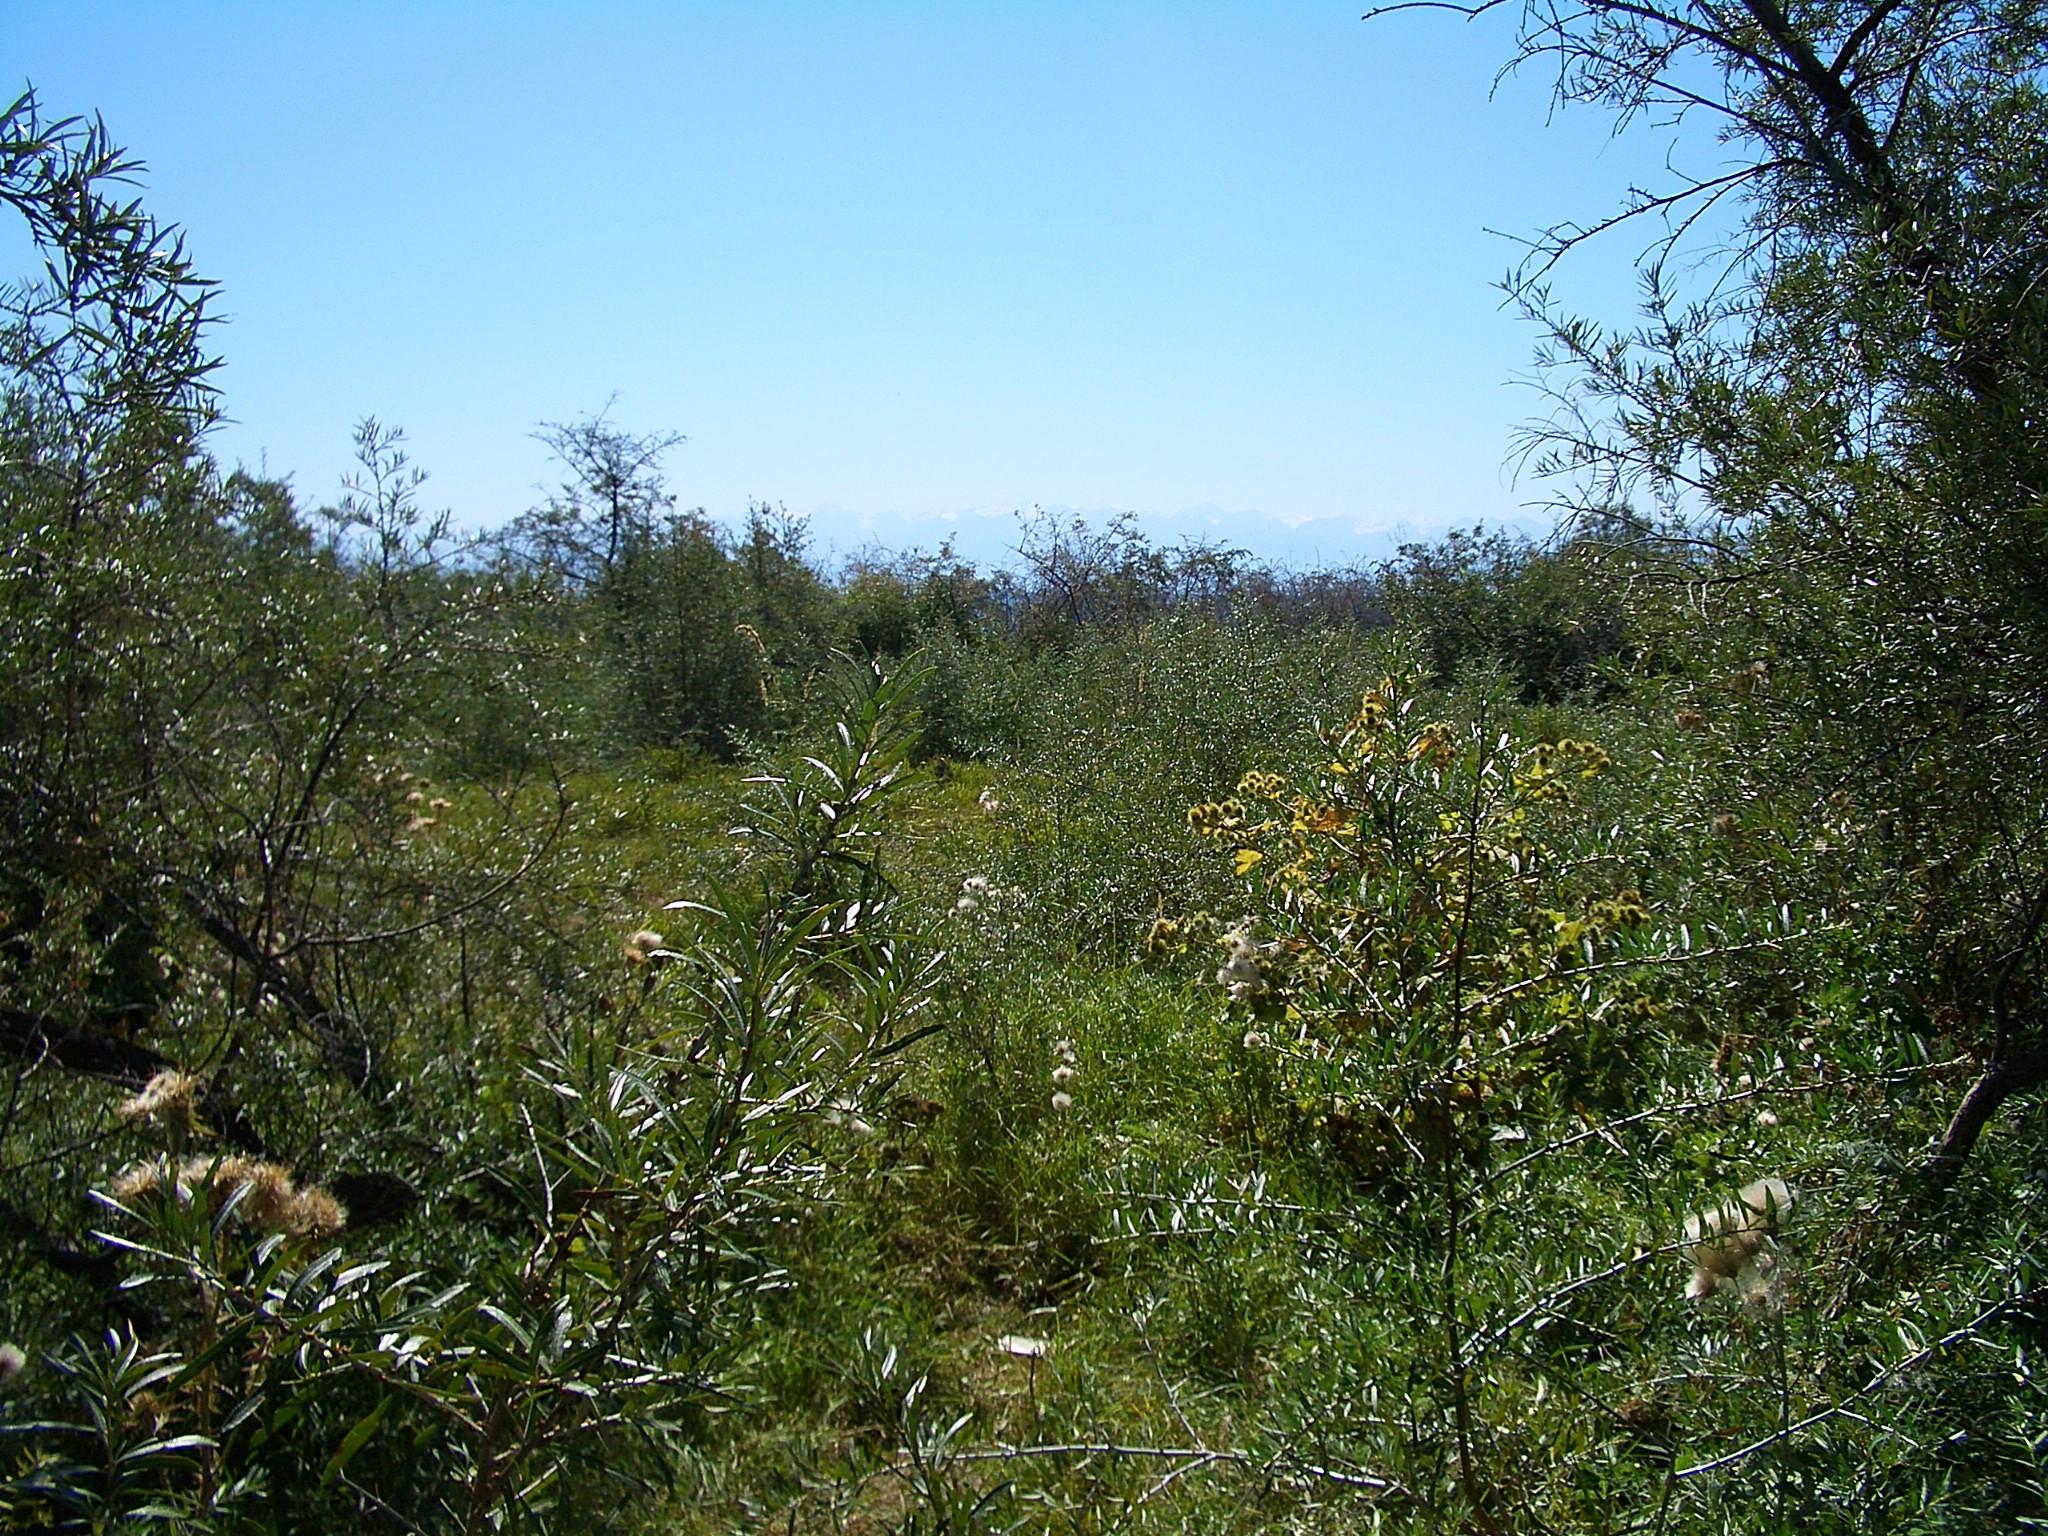 cbaby cherie wetlands: http://de.jpg4.info/cbaby cherie wetlands/pic1.html